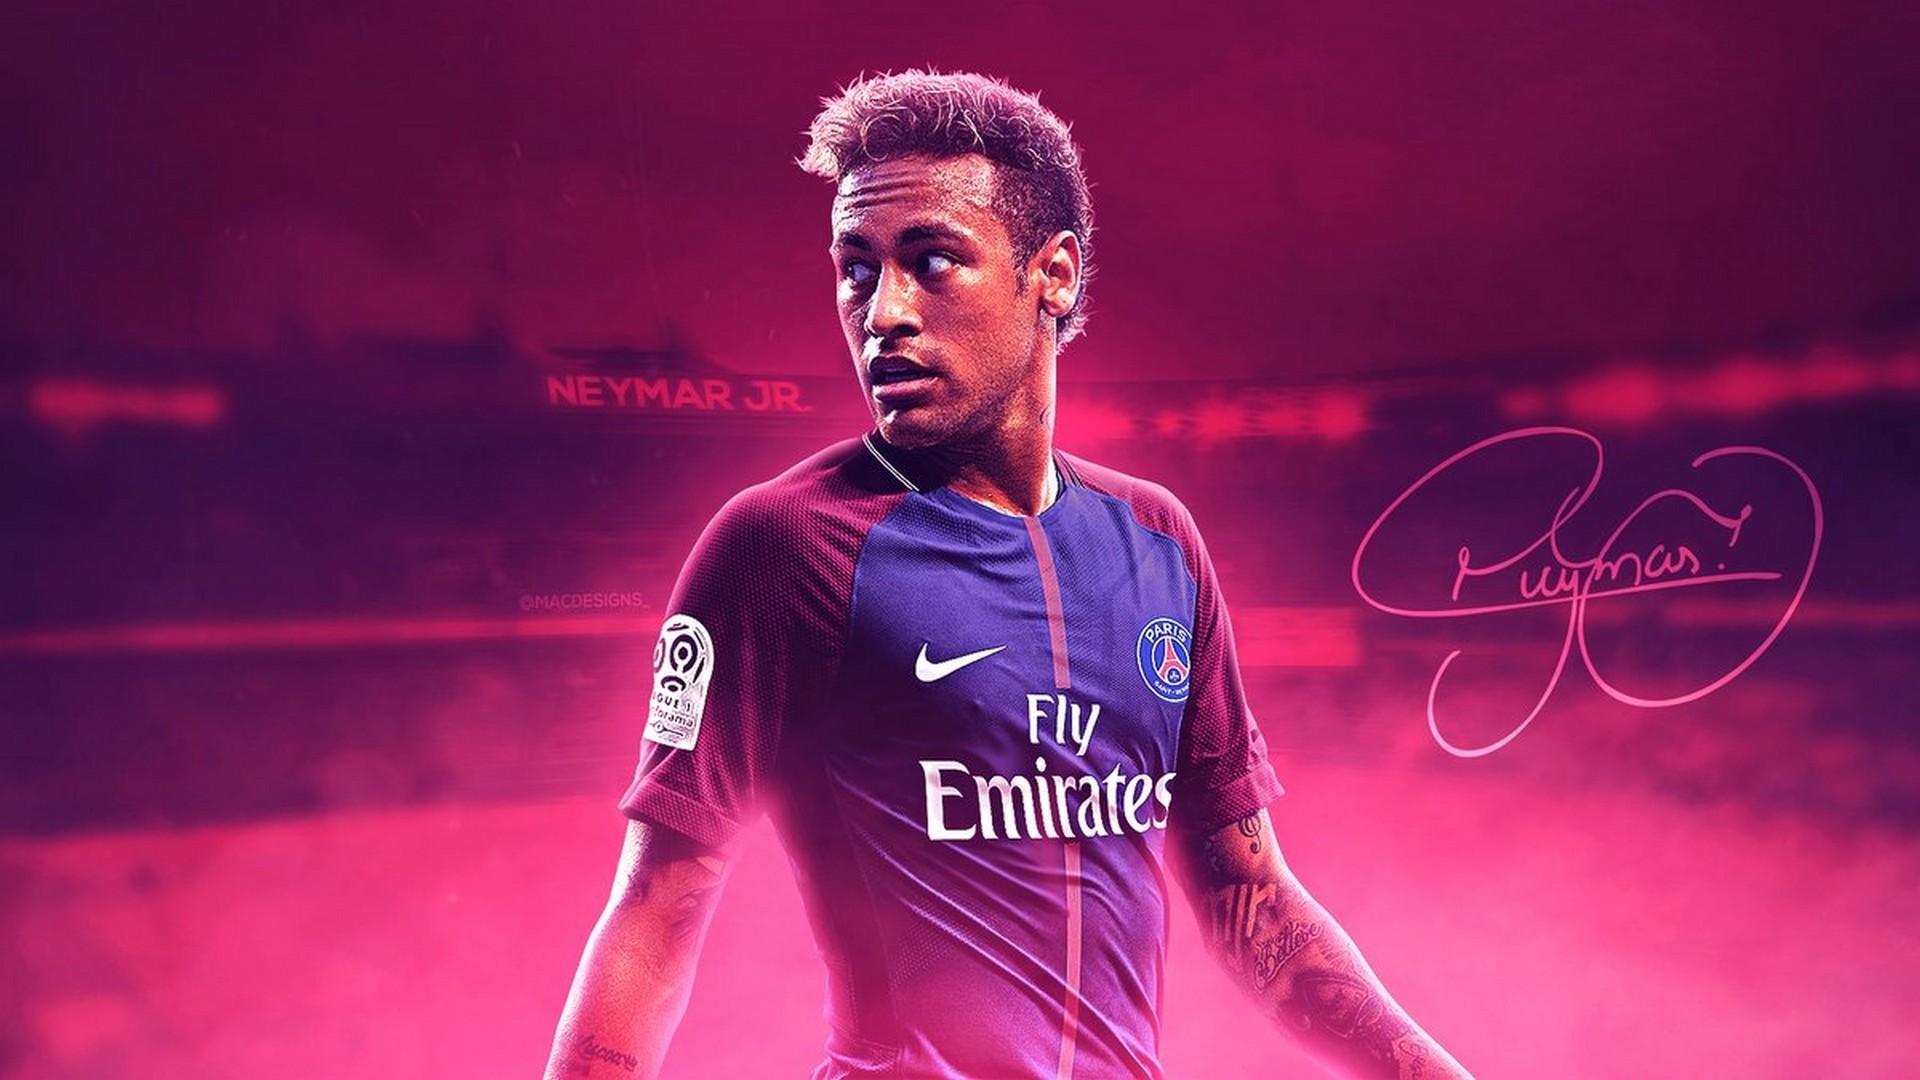 Neymar Jr Desktop Wallpaper